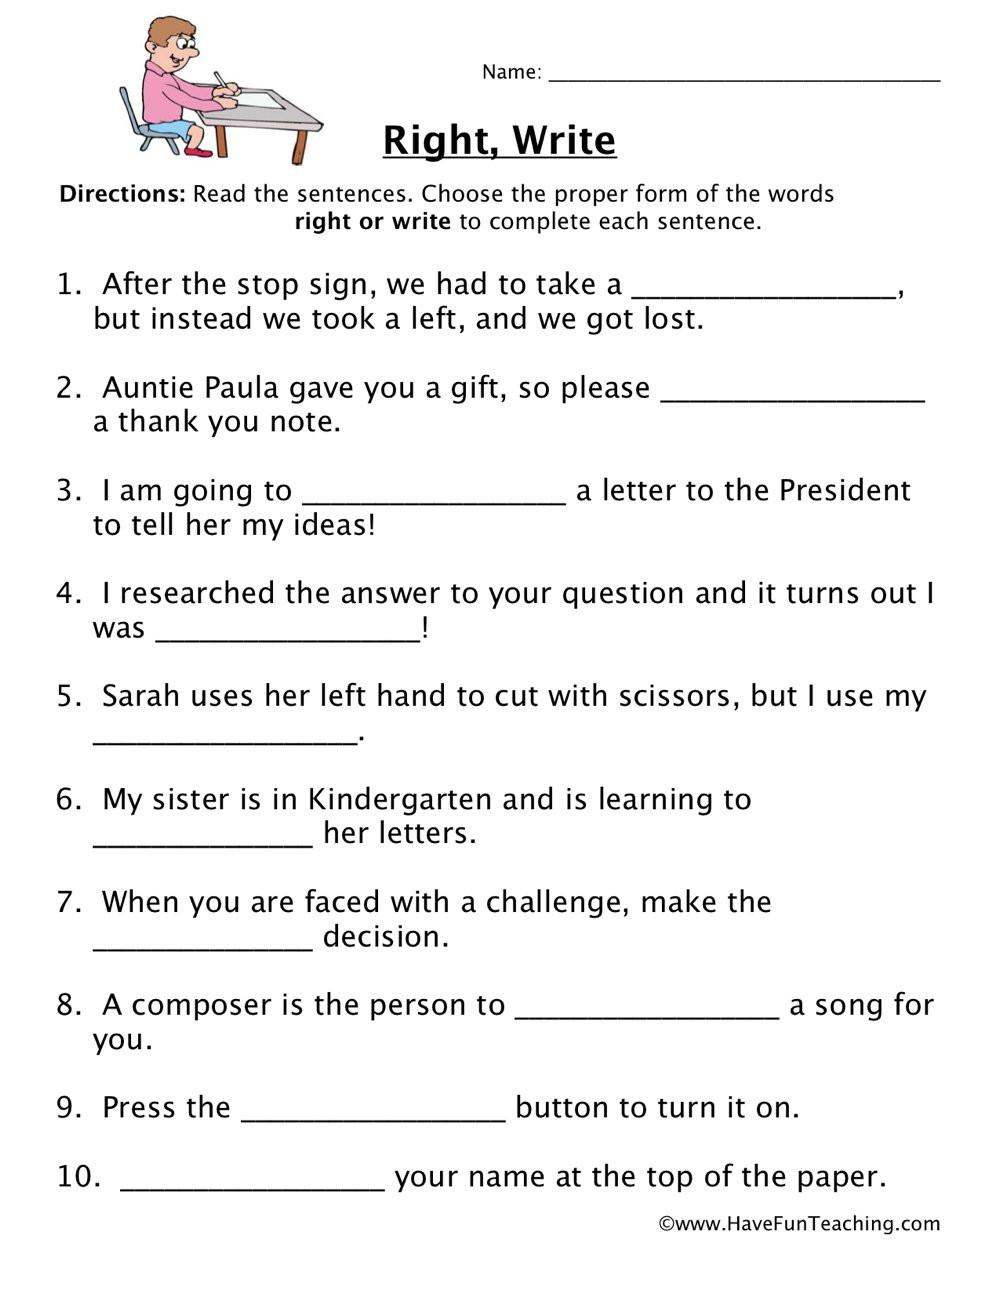 Homonyms Worksheets 5th Grade Right Write Homophones Worksheet